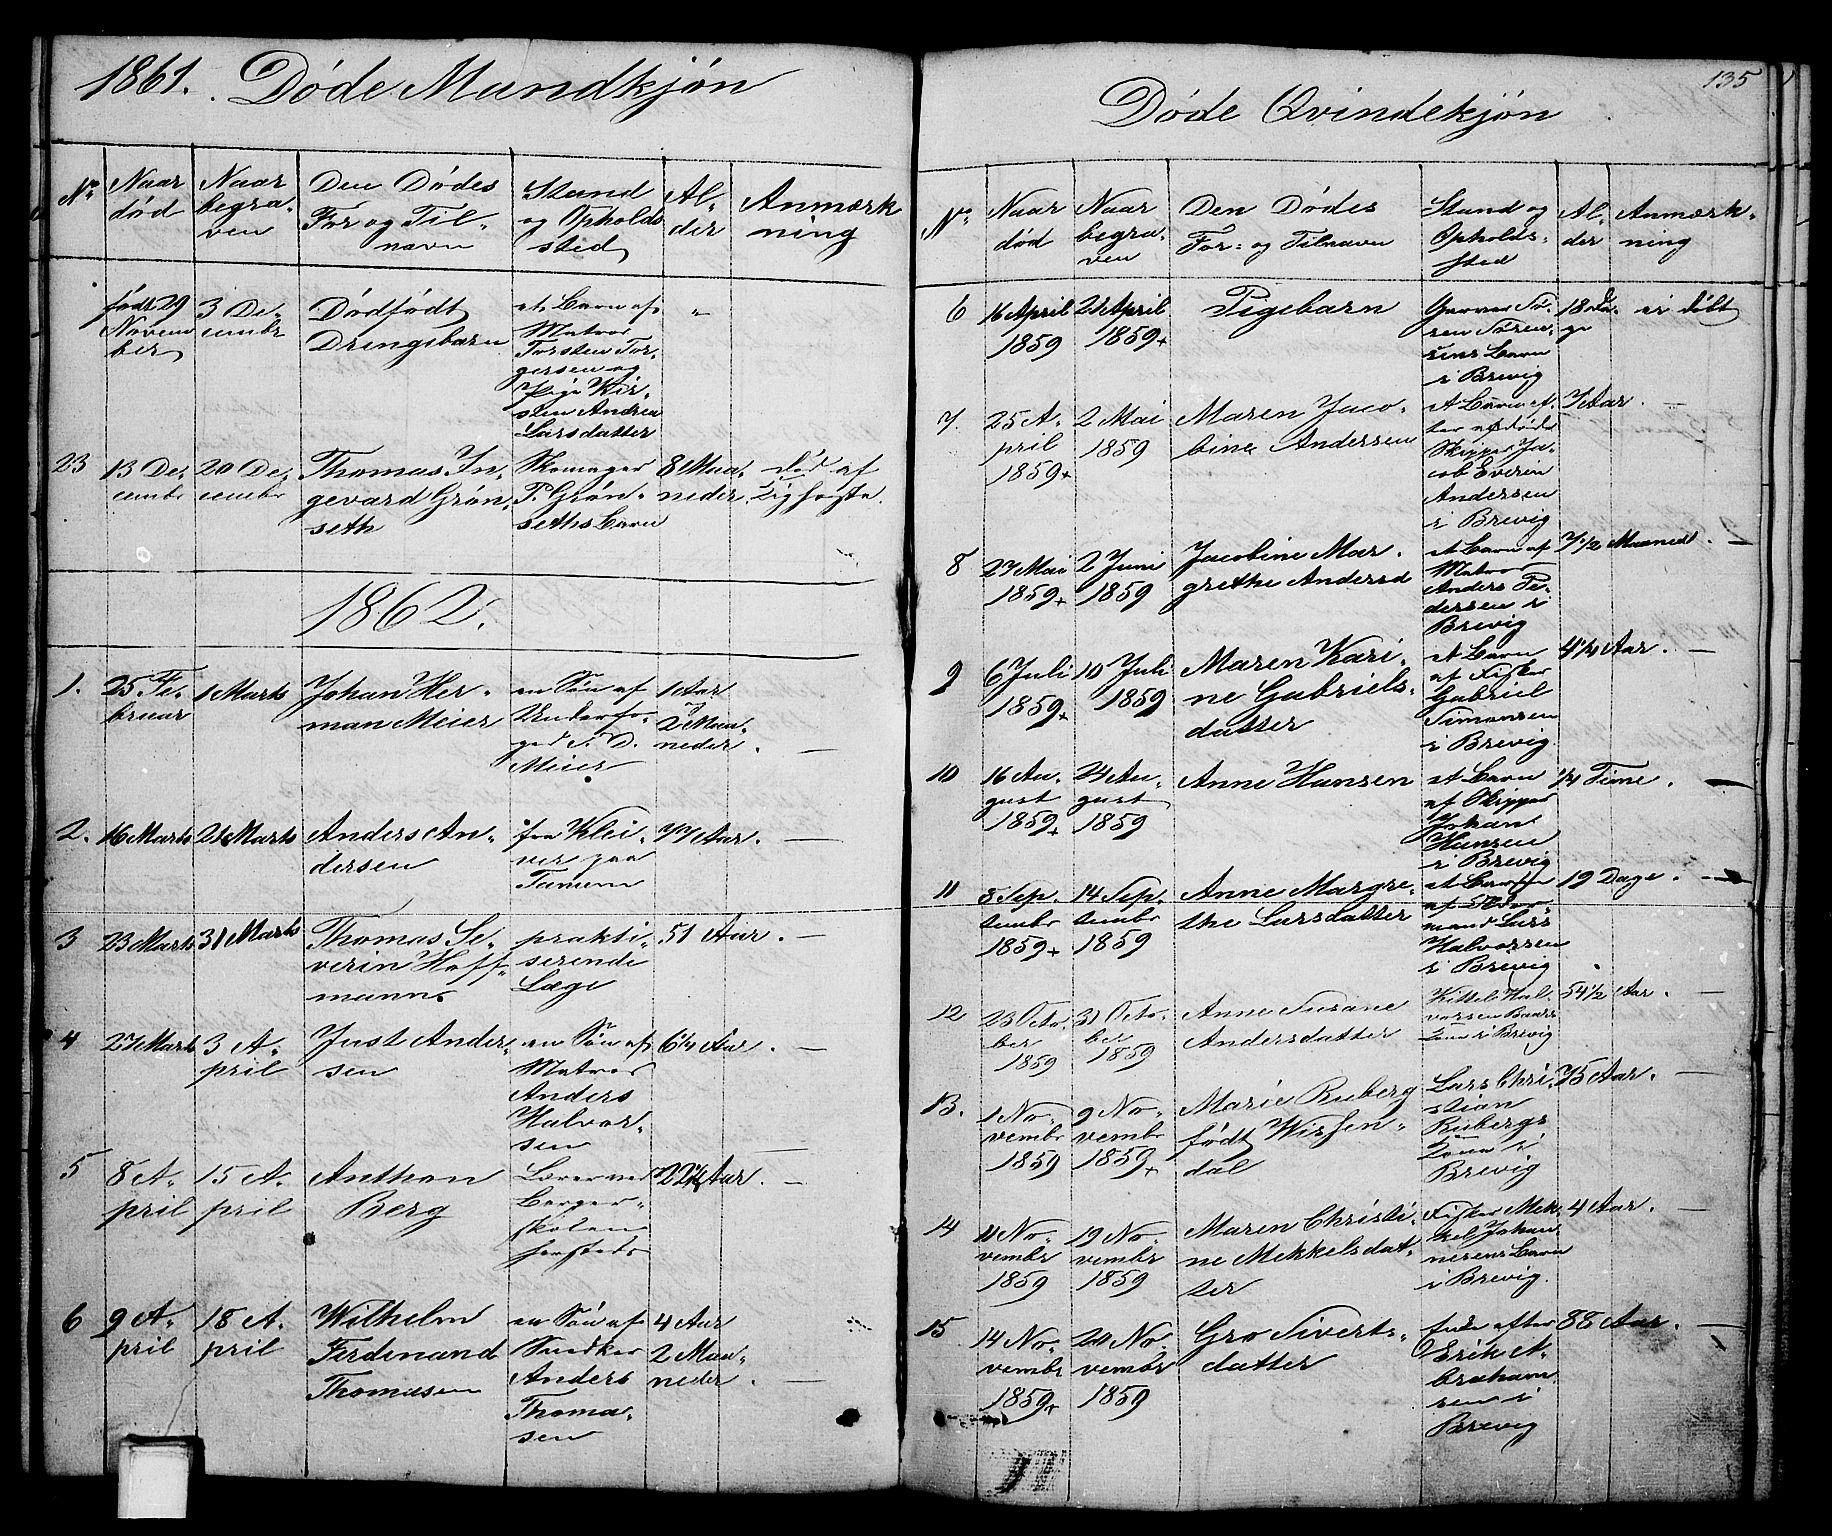 SAKO, Brevik kirkebøker, G/Ga/L0002: Klokkerbok nr. 2, 1846-1865, s. 135